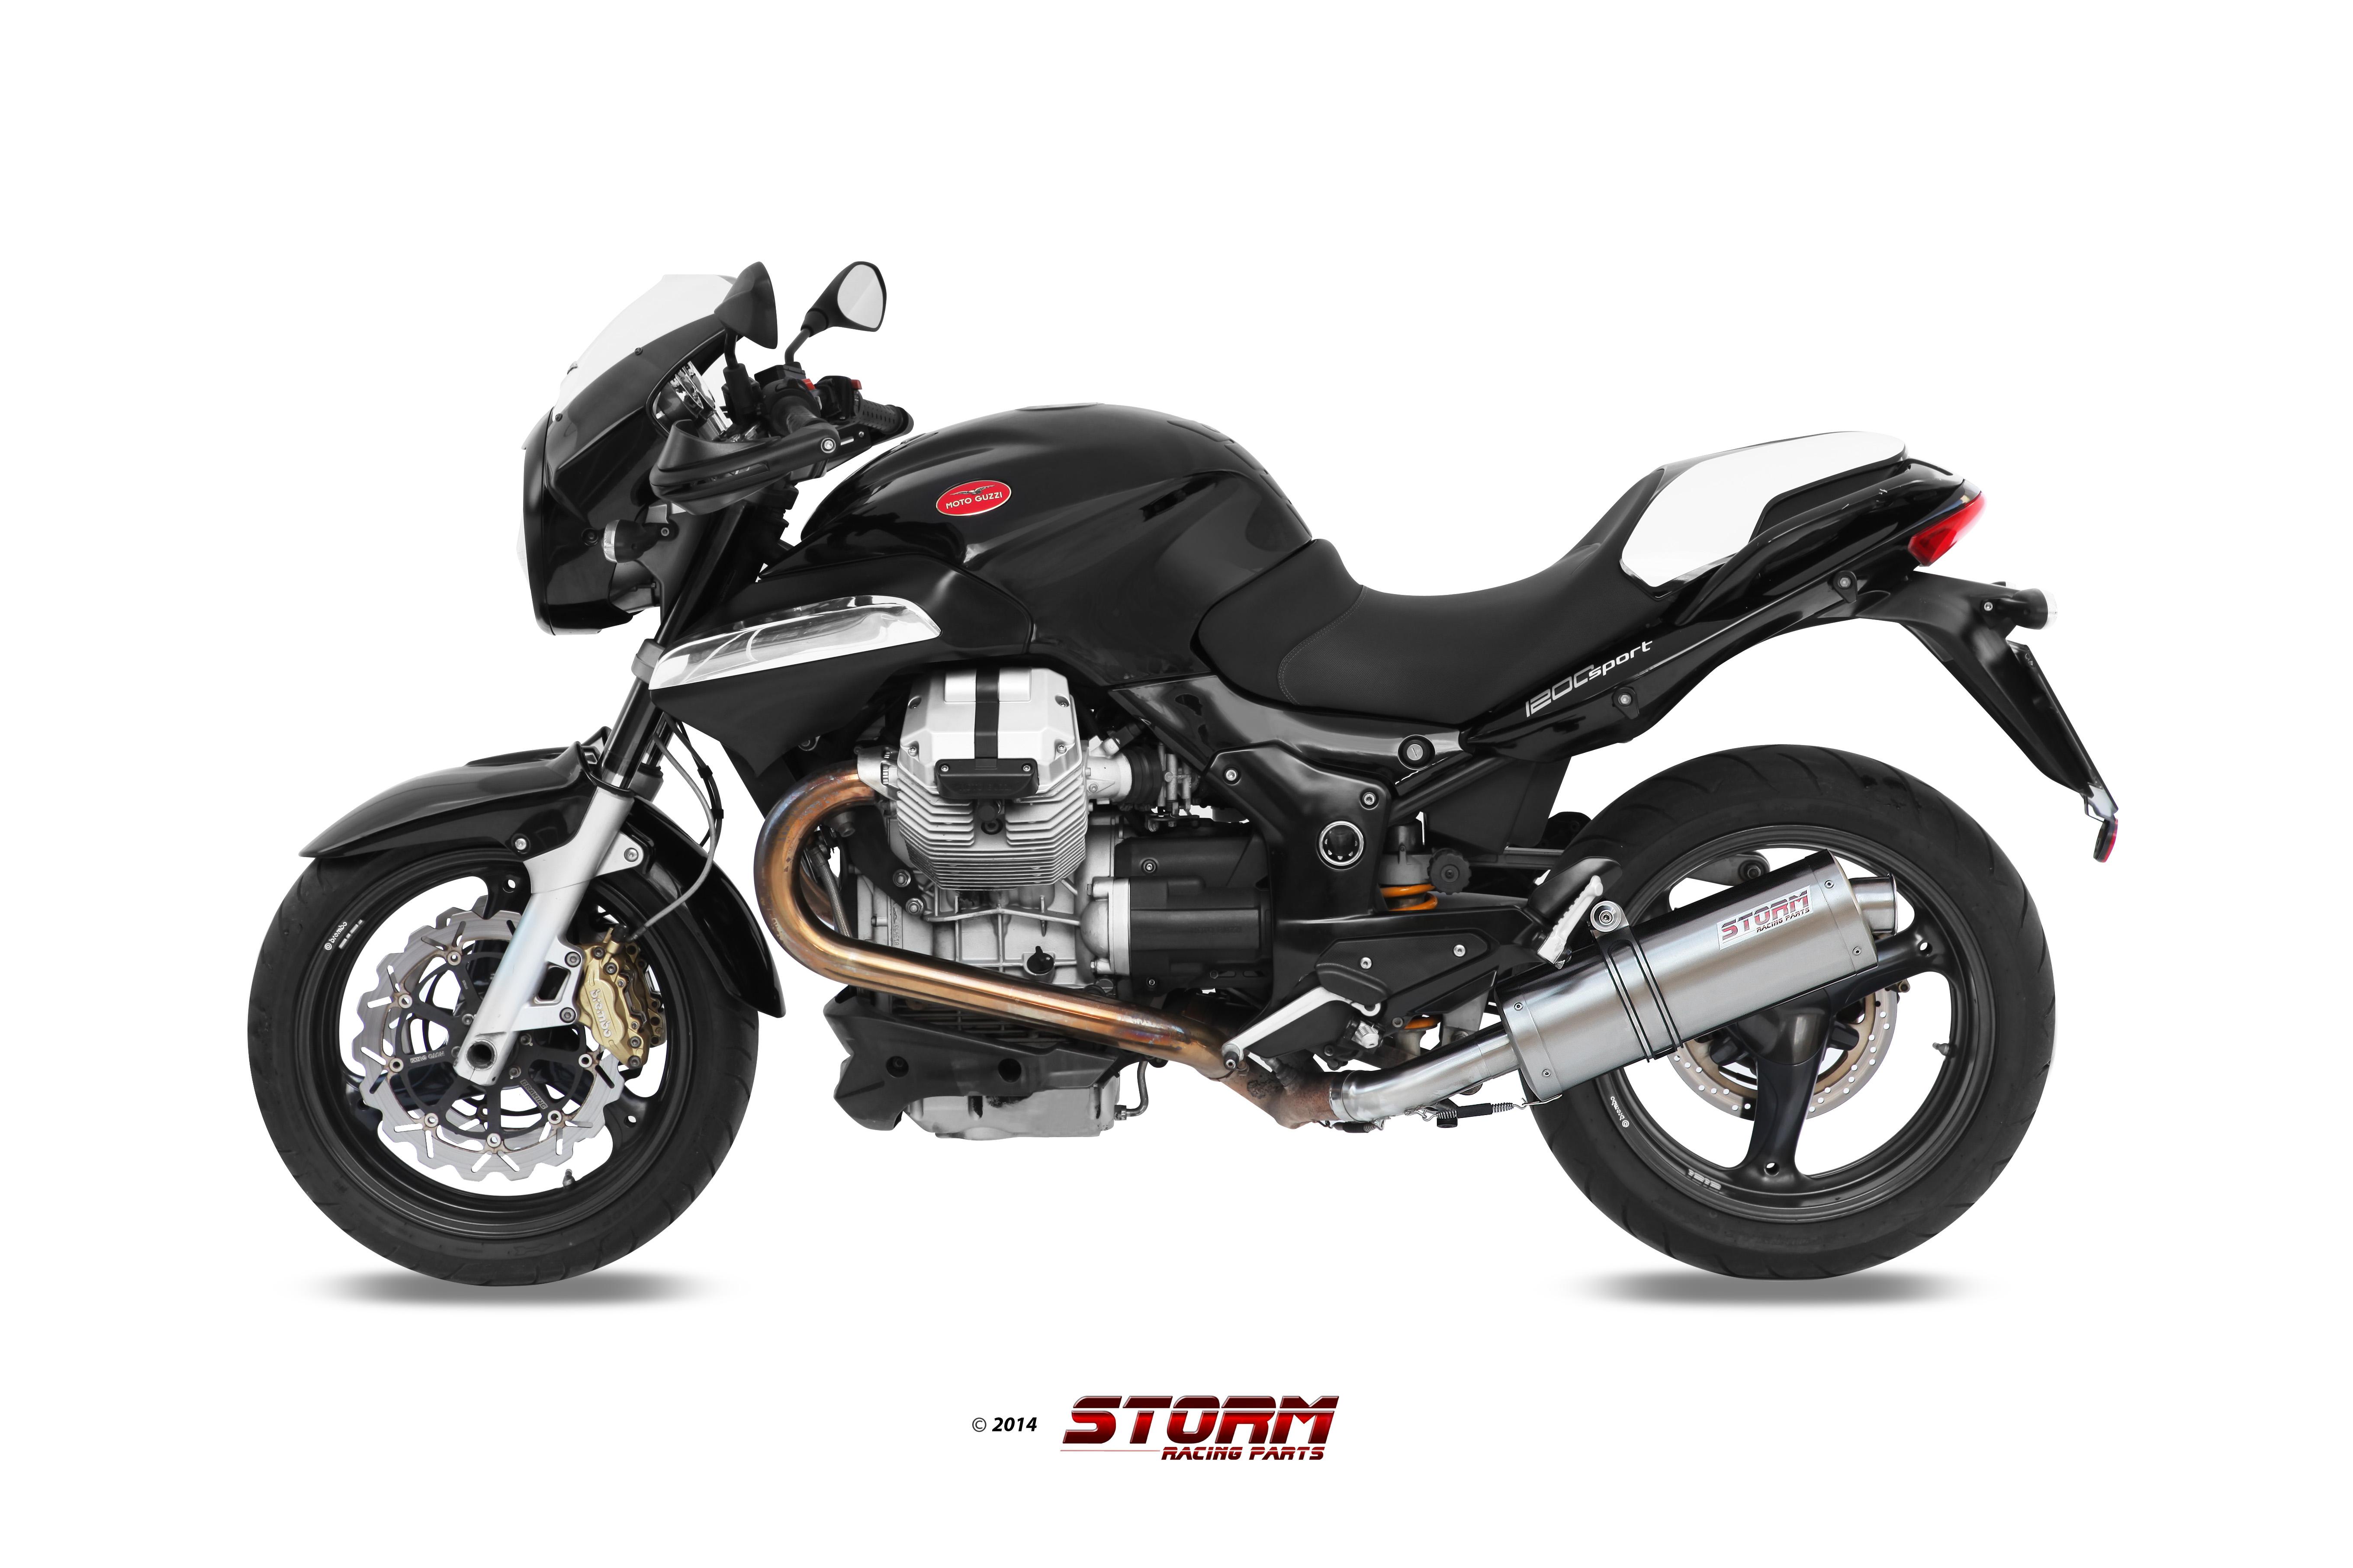 MOTO GUZZI BREVA 1200 Exhaust Storm Oval Stainless steel 74.M.008.LX2